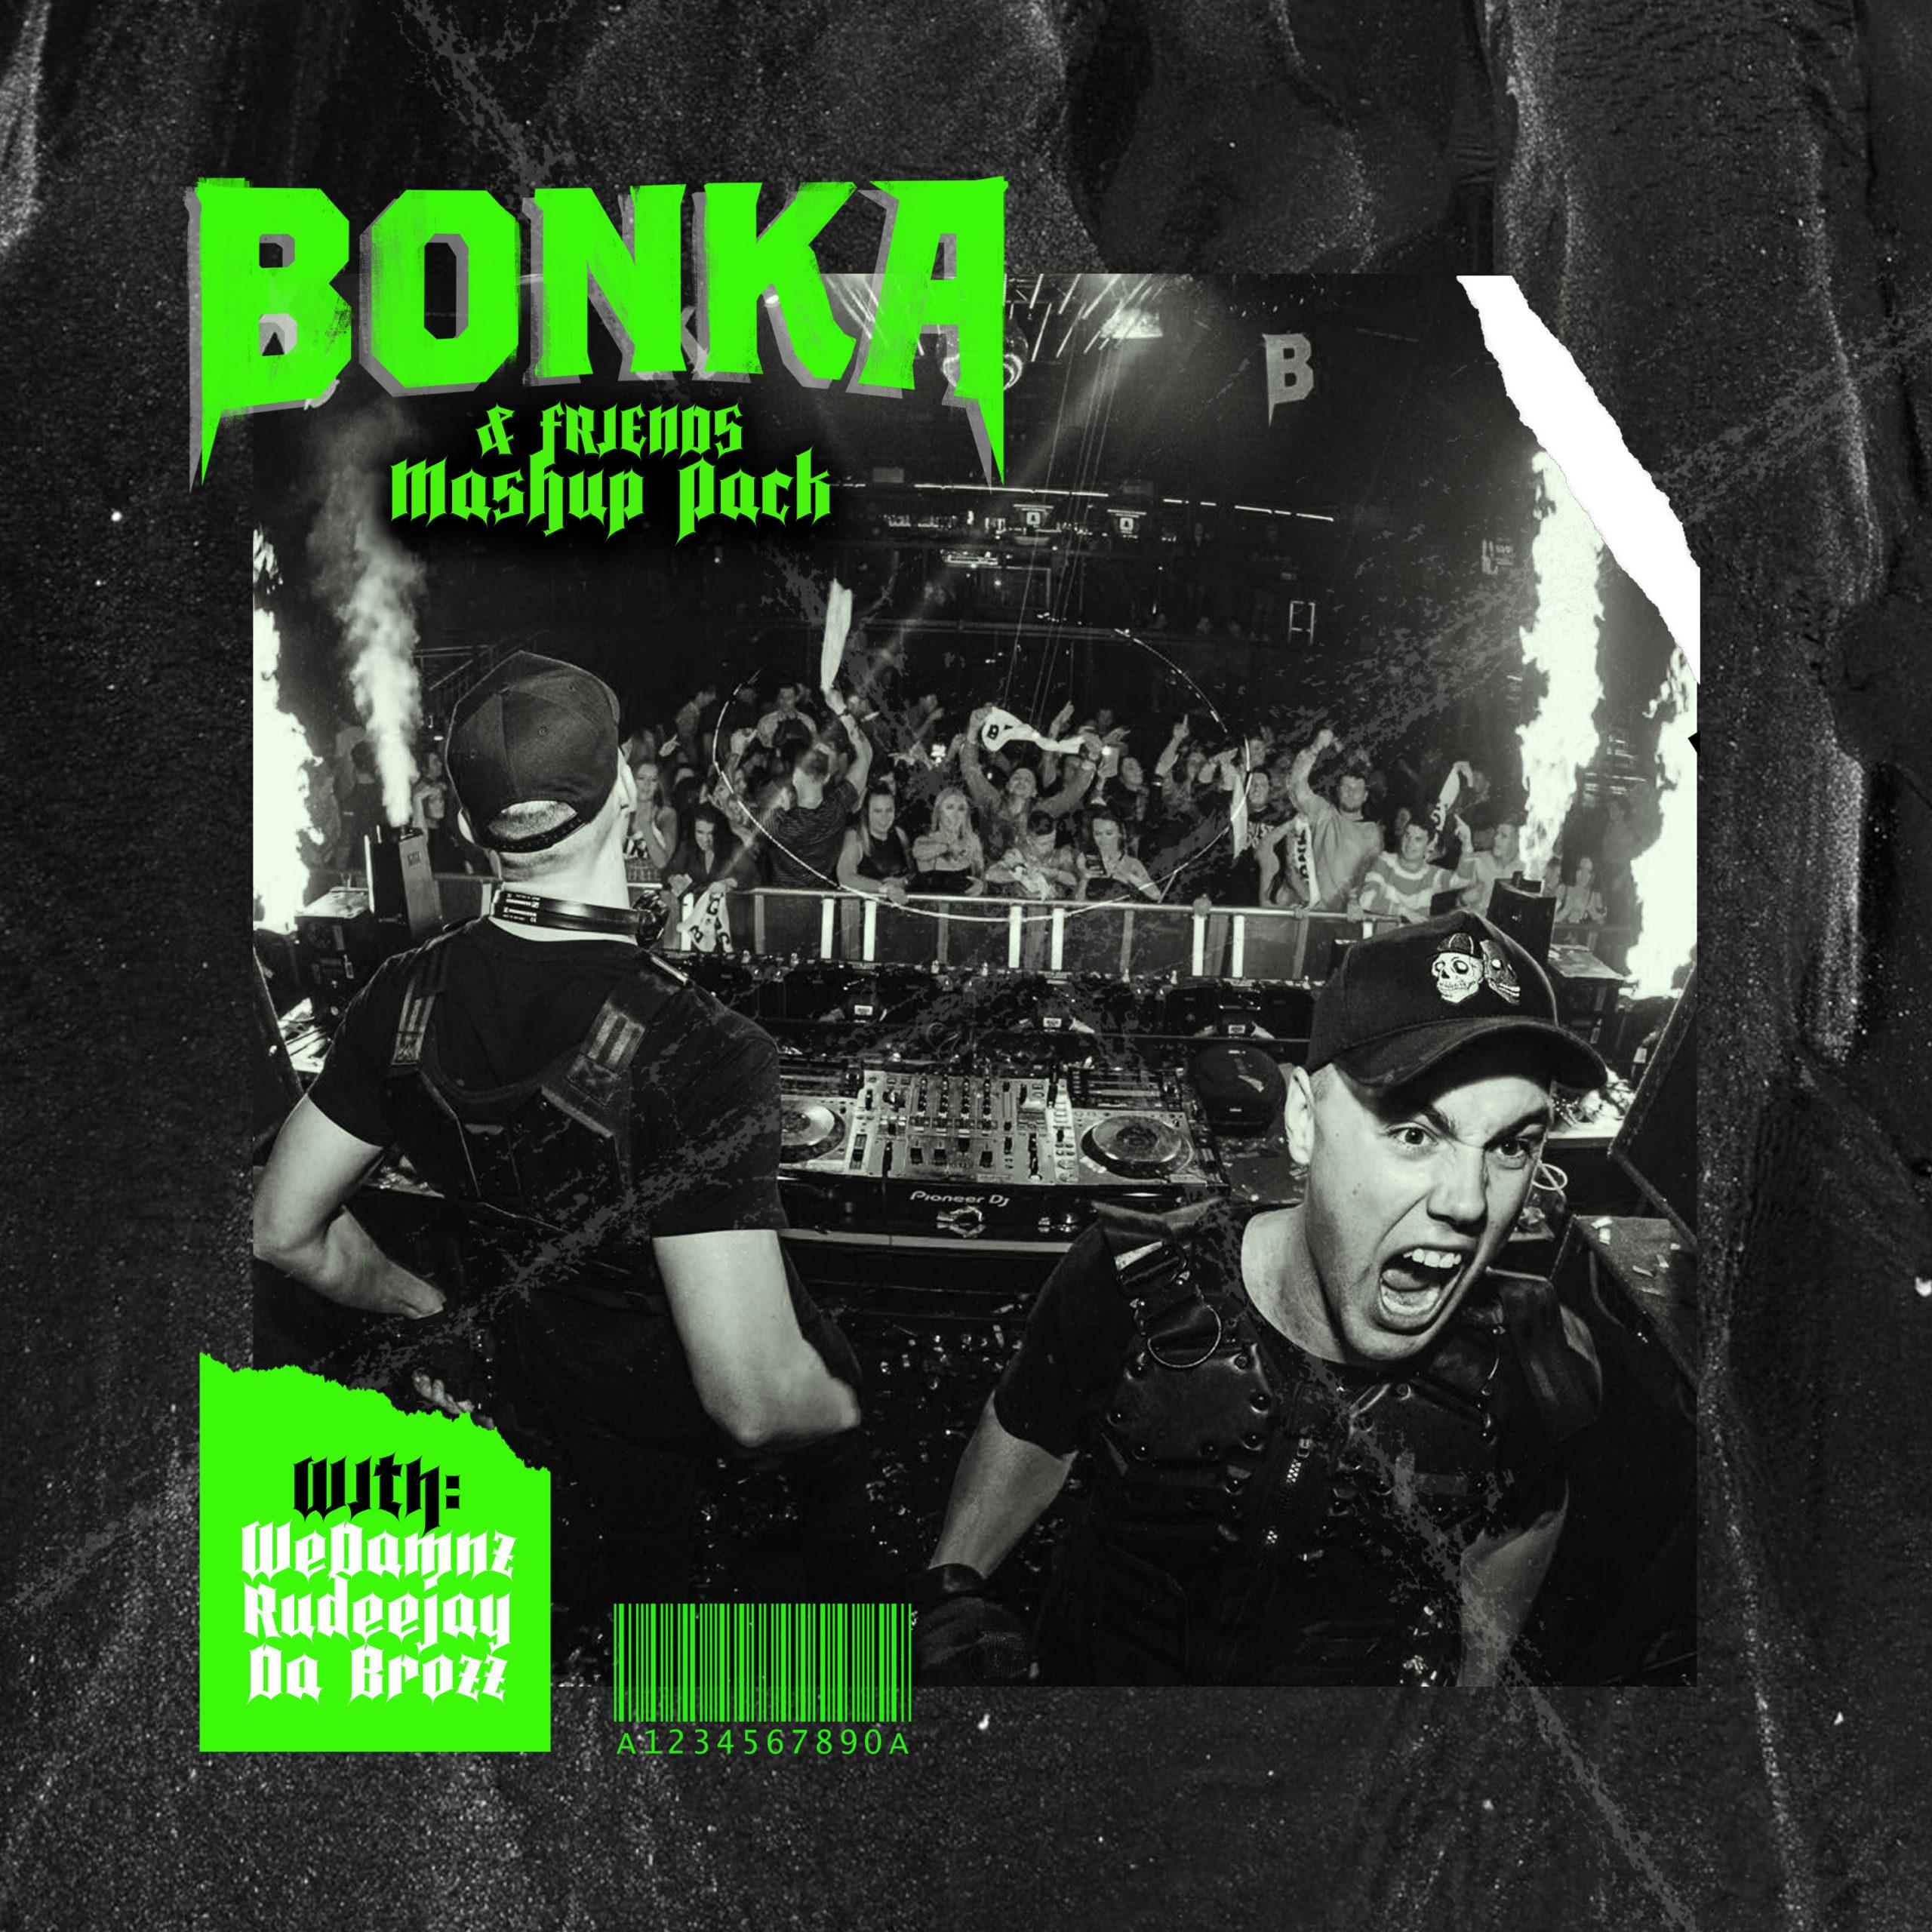 BONKA & Friends Mashup Pack Mixtape (ft. WeDamnz, Rudeejay & Da Brozz)